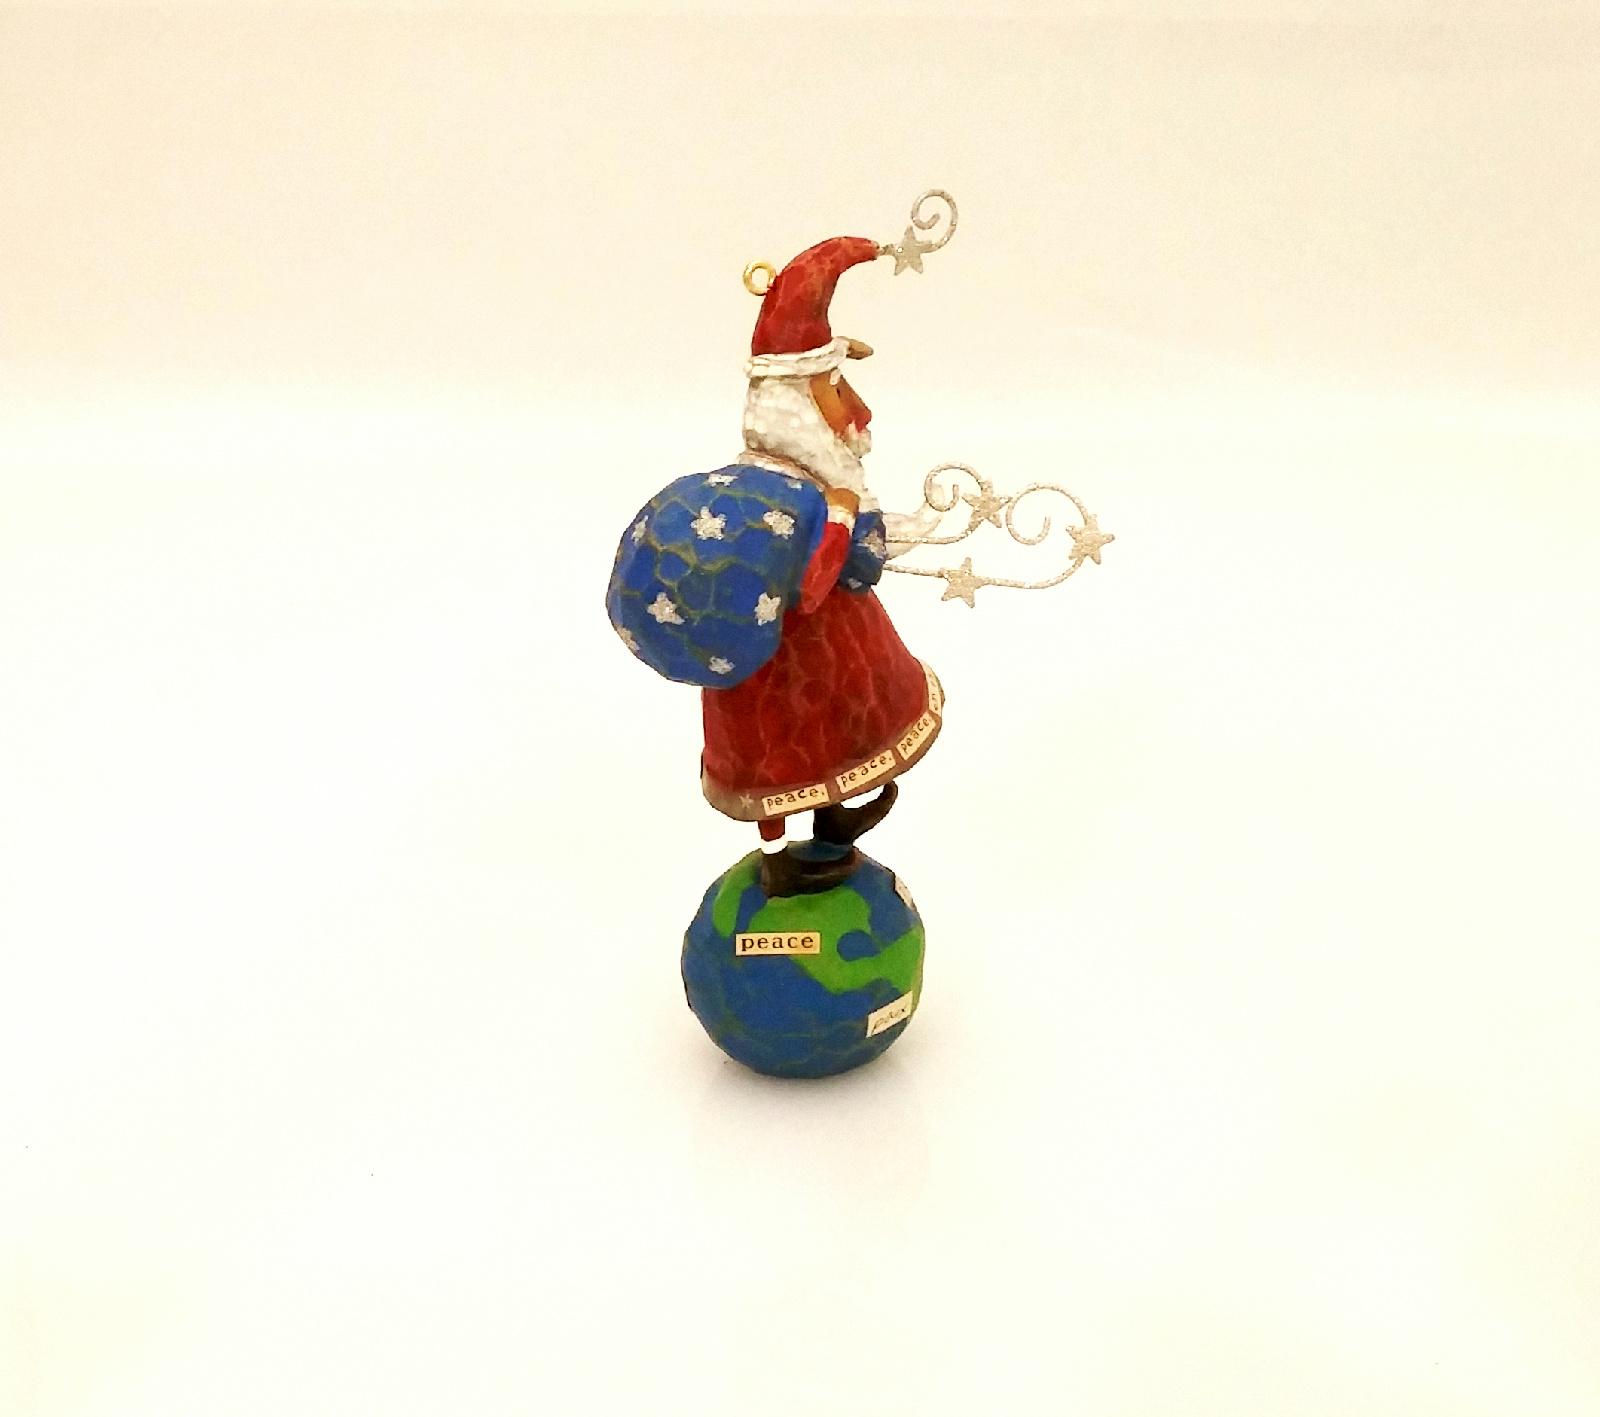 2008 Hallmark Ornaments